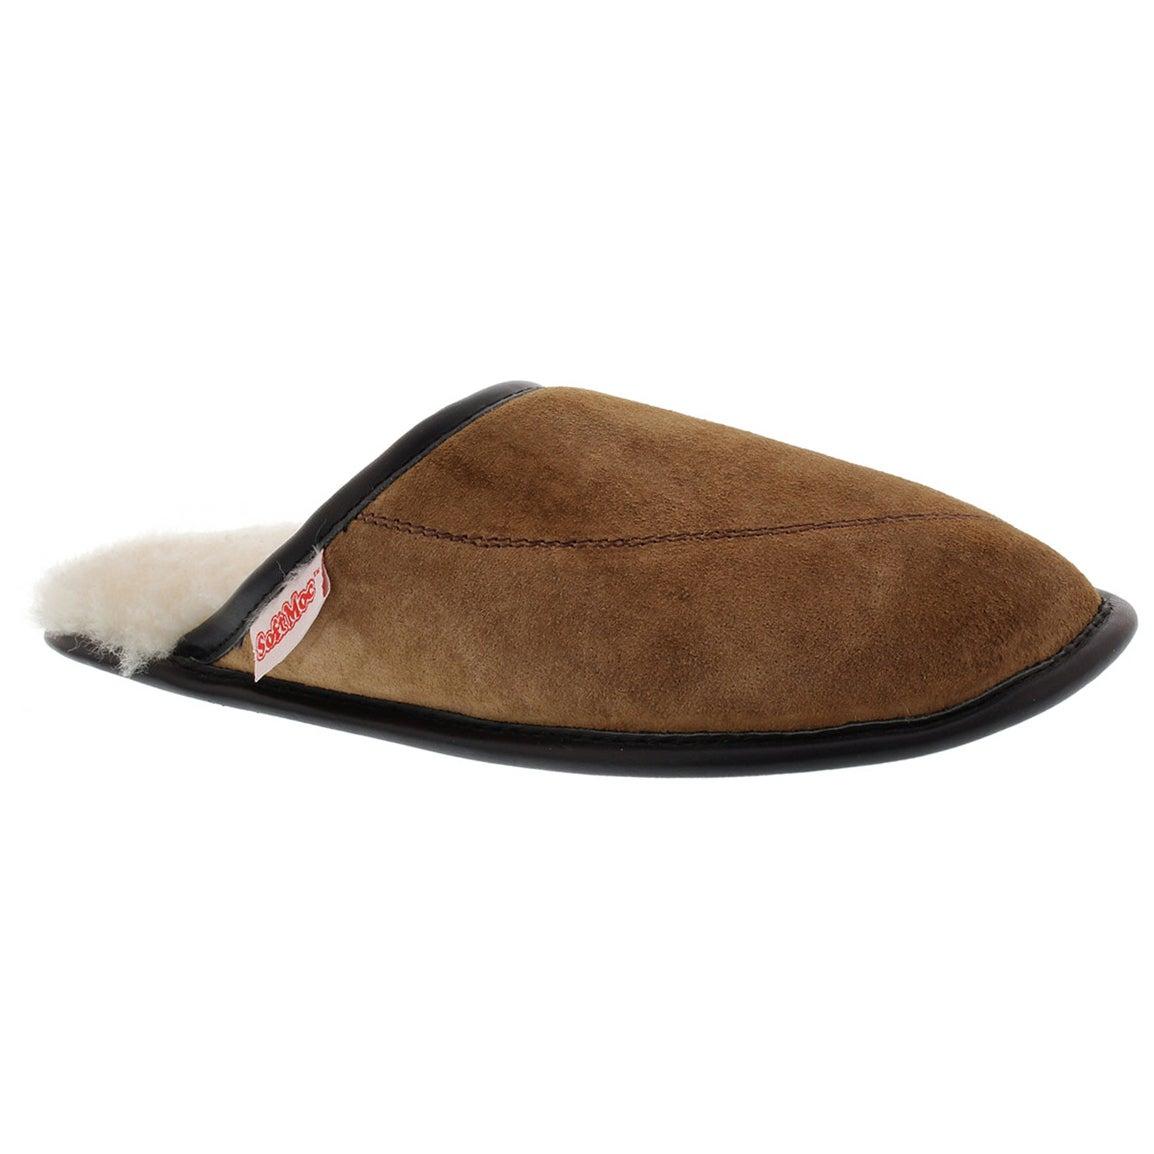 Women's SCUFF spice washable sheepskin slippers